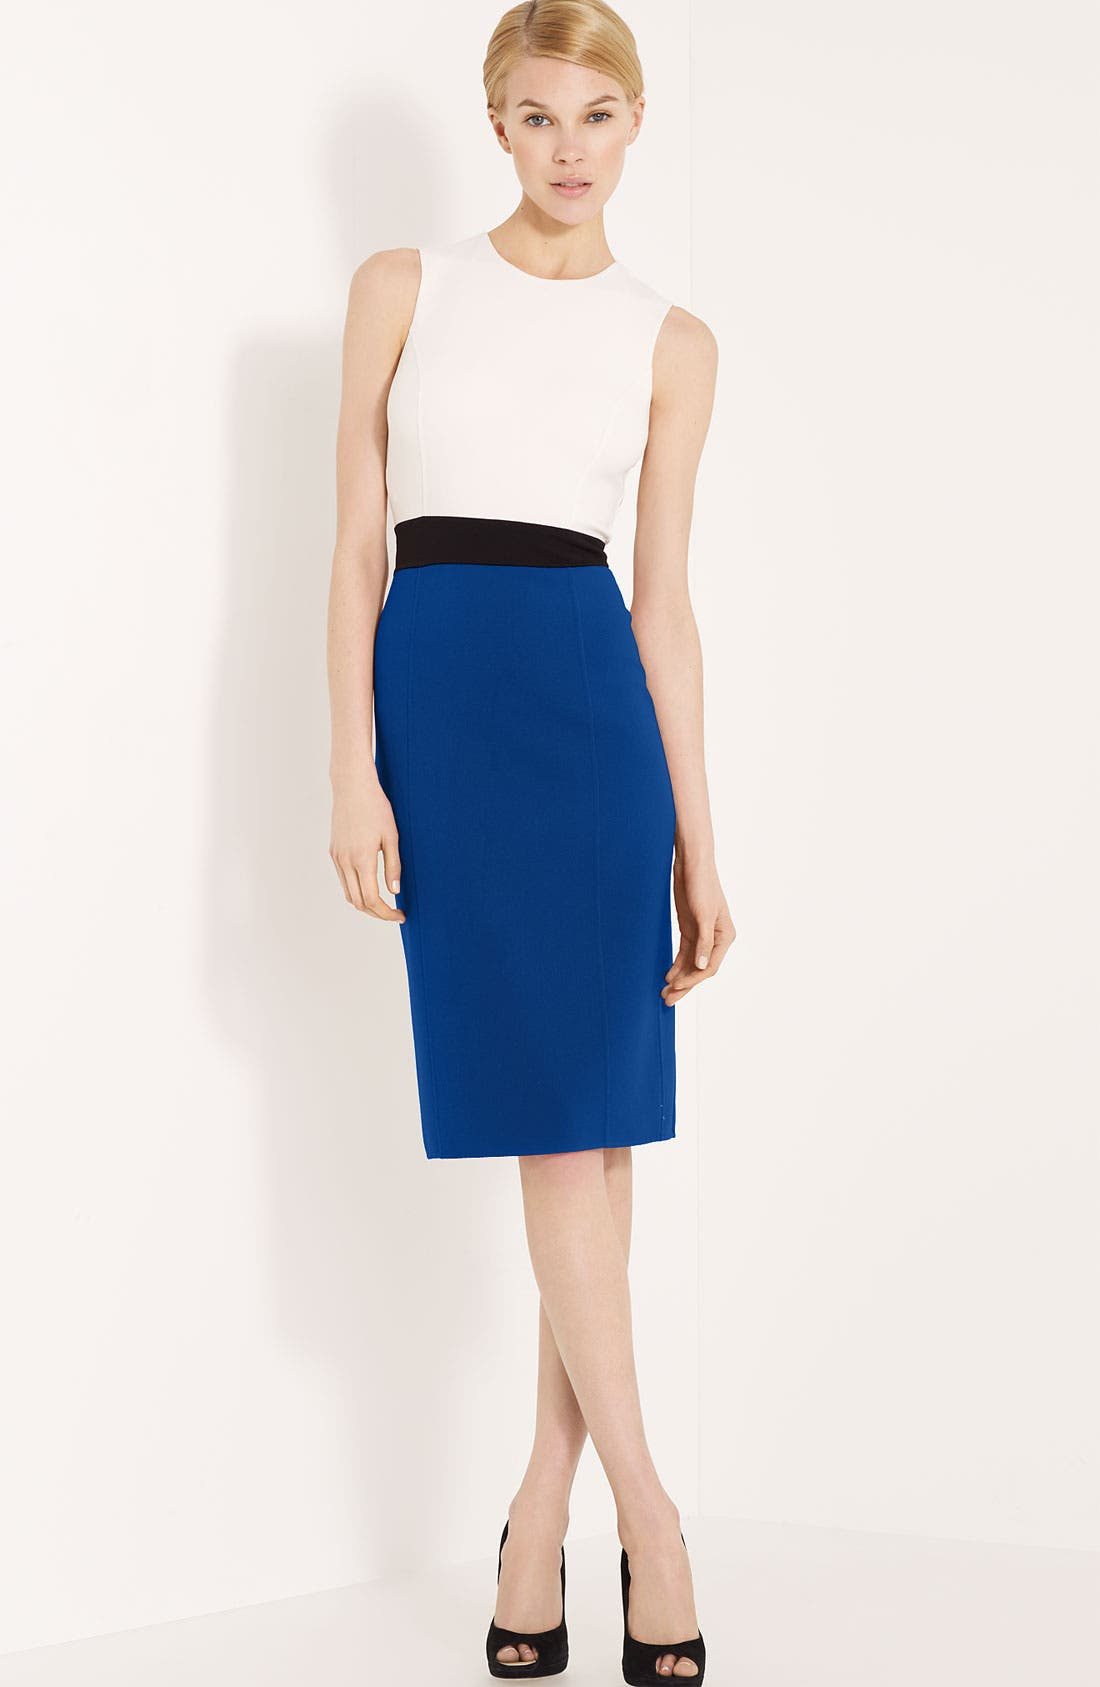 Alternate Image 1 Selected - Michael Kors Colorblock Stretch Wool Crepe Dress